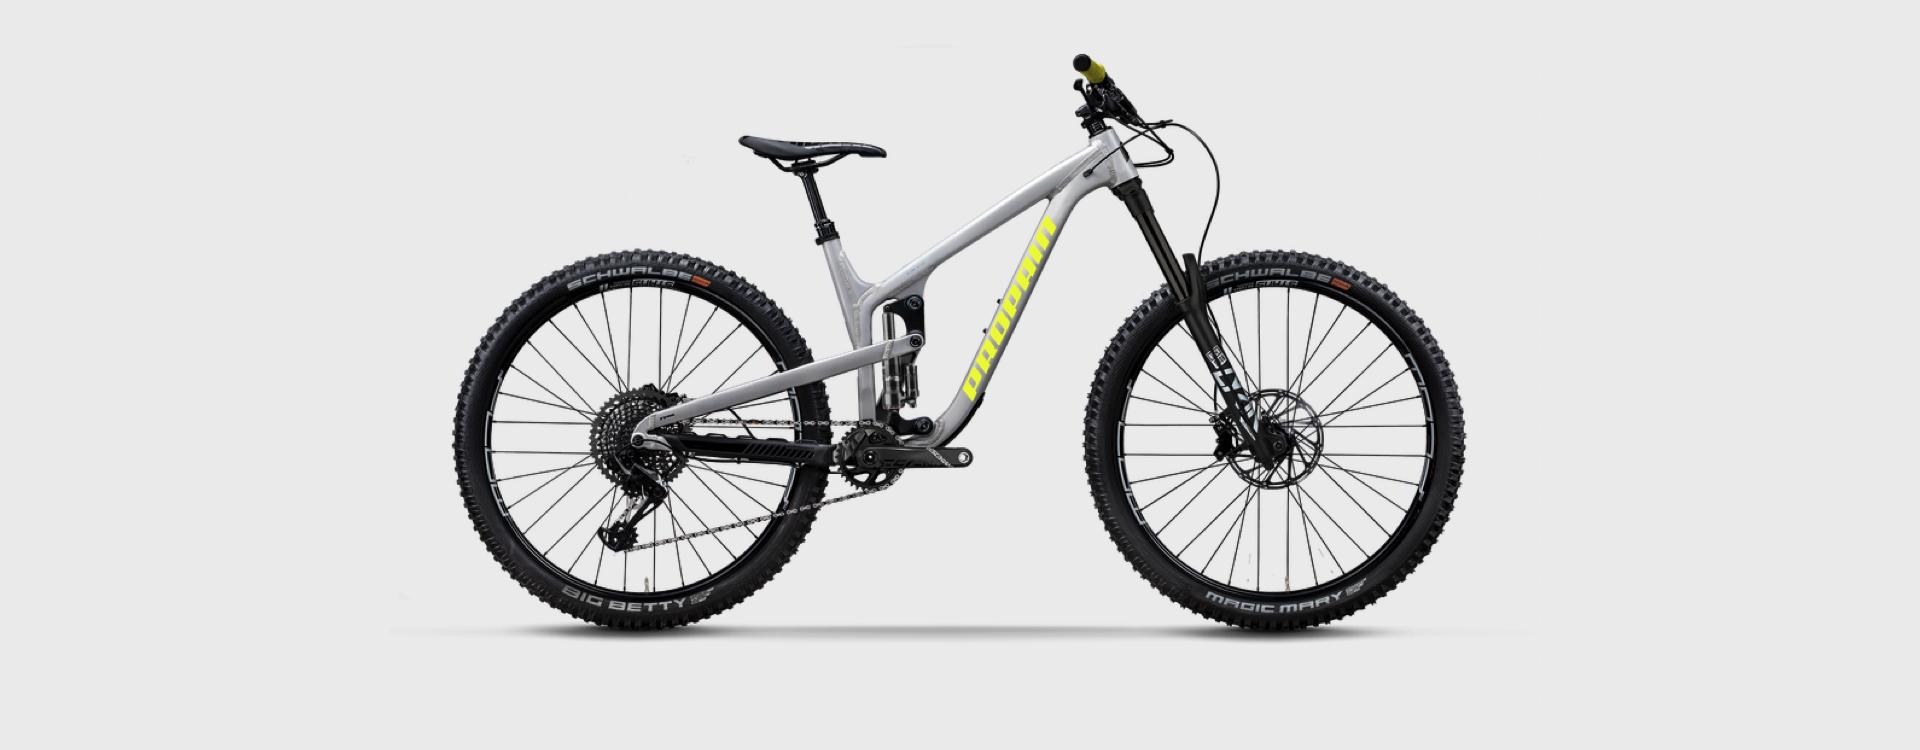 Bike Verleih Gummersbach Propain Bikes Testcenter NRW Tyee 5 - AL - L - 650B - Raw - 1920x750